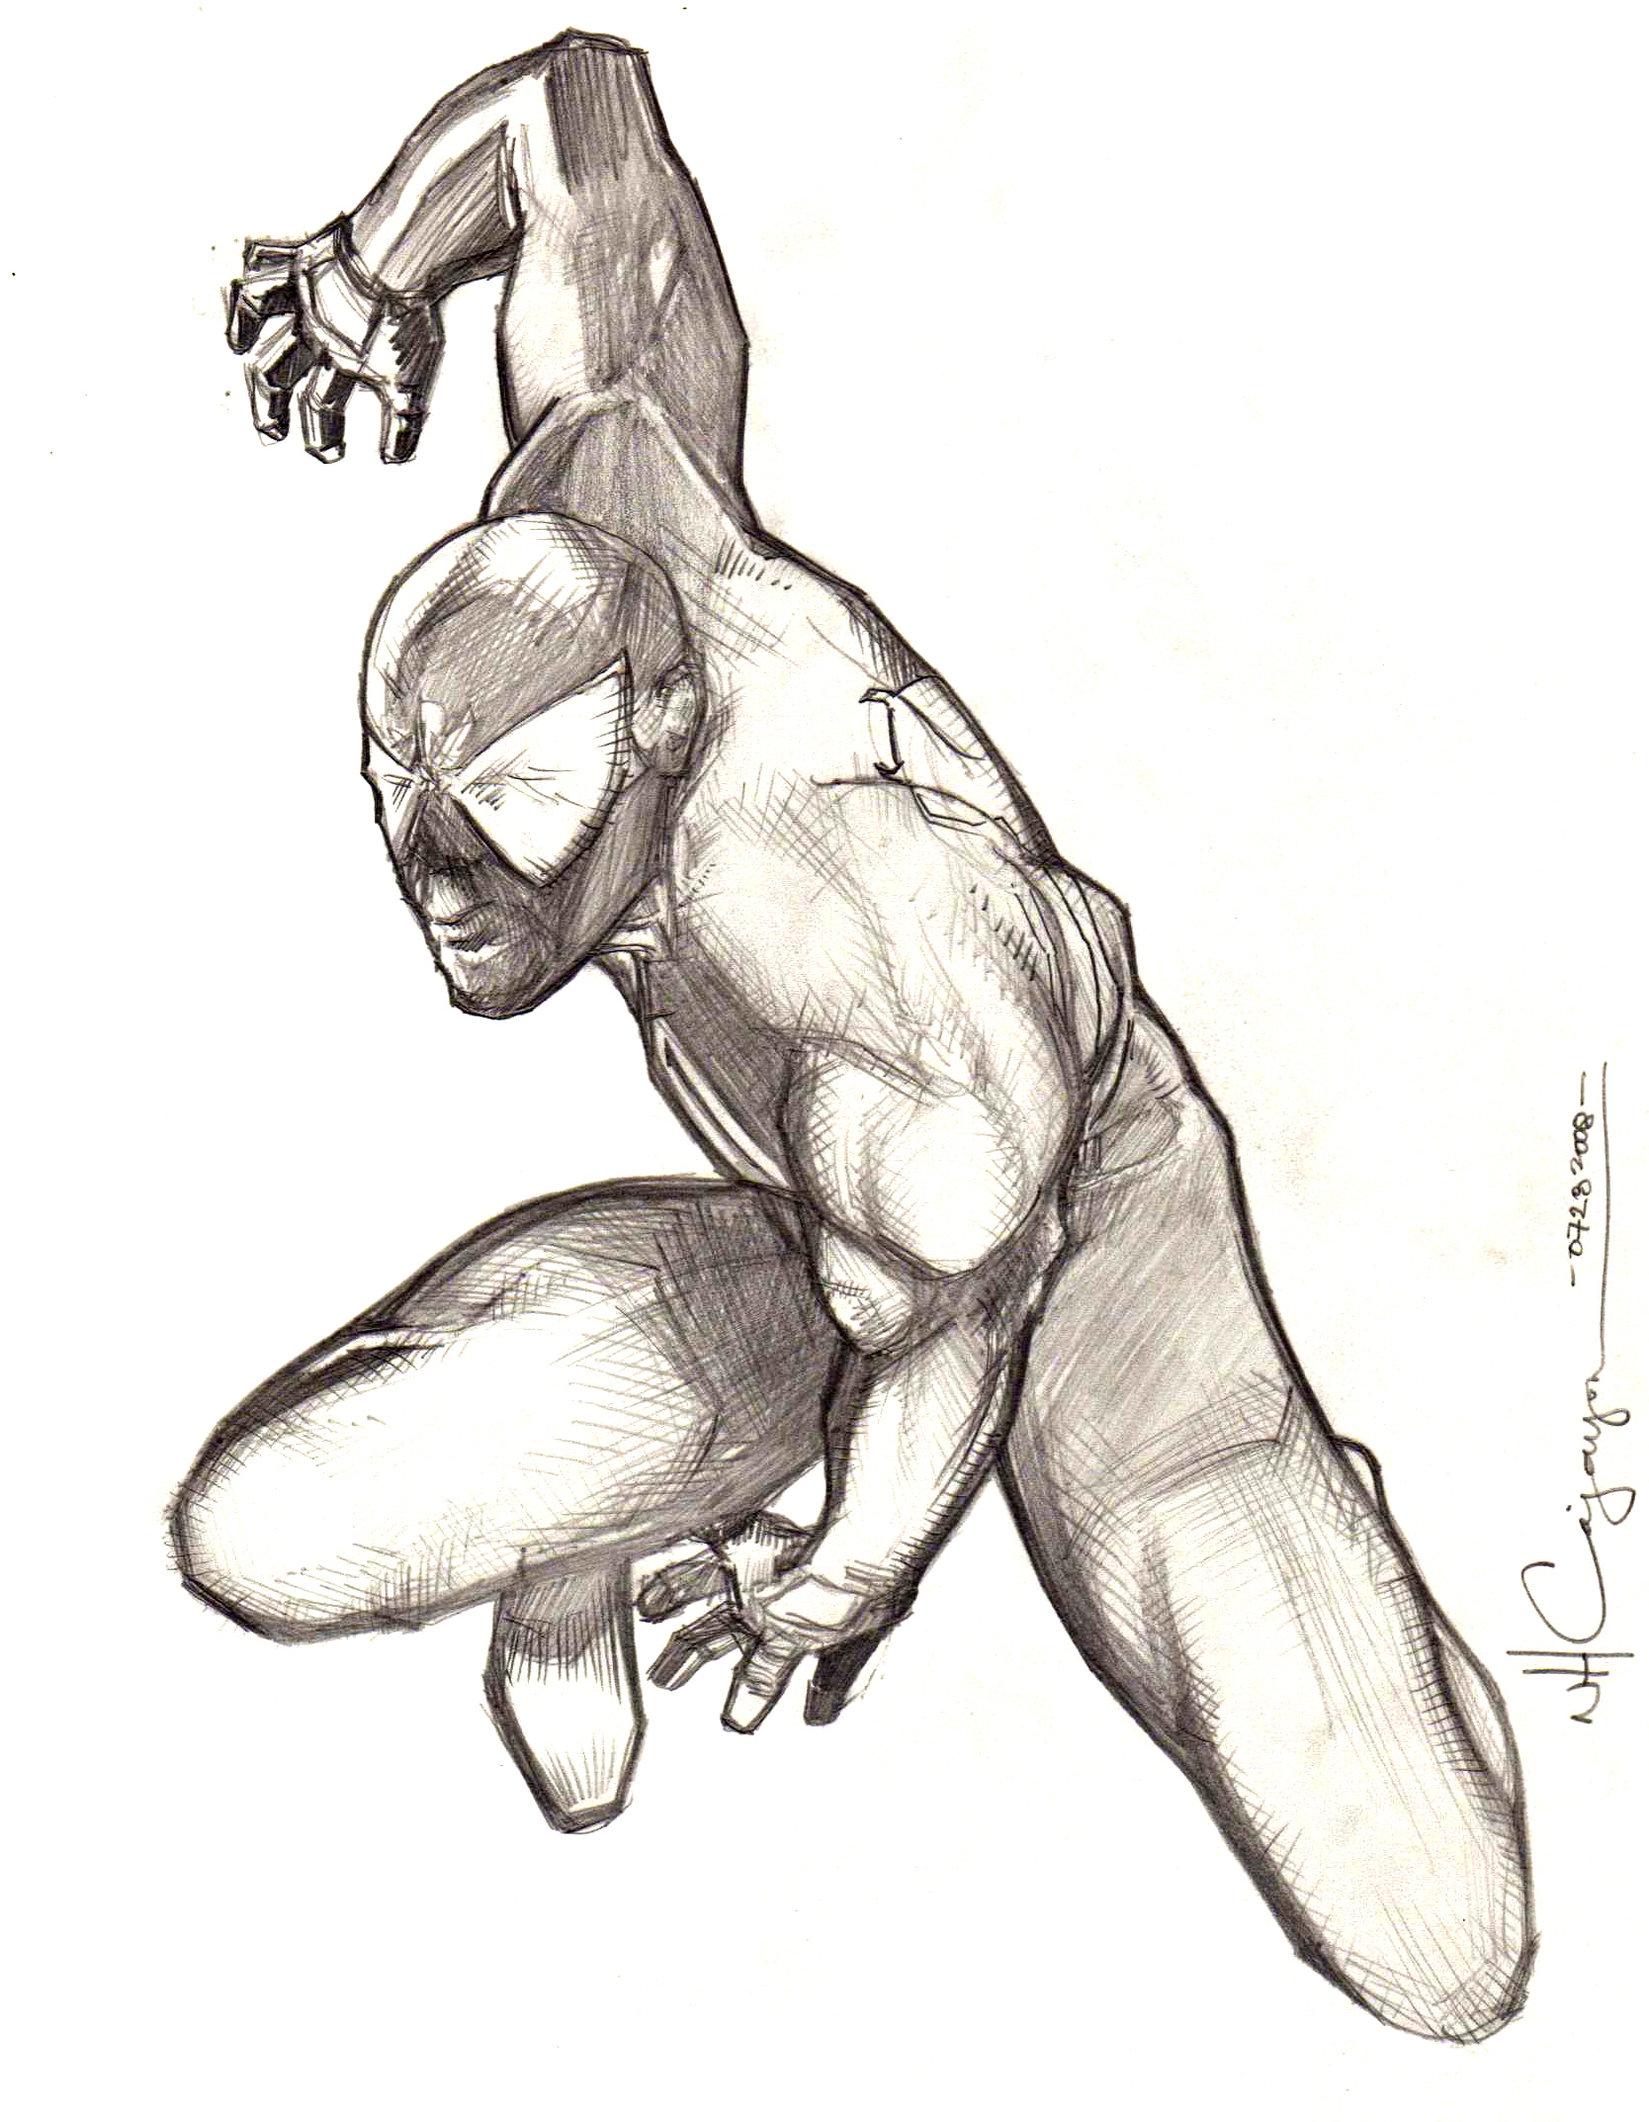 1649x2122 Spider Man Pencil 2 By Ncajayon